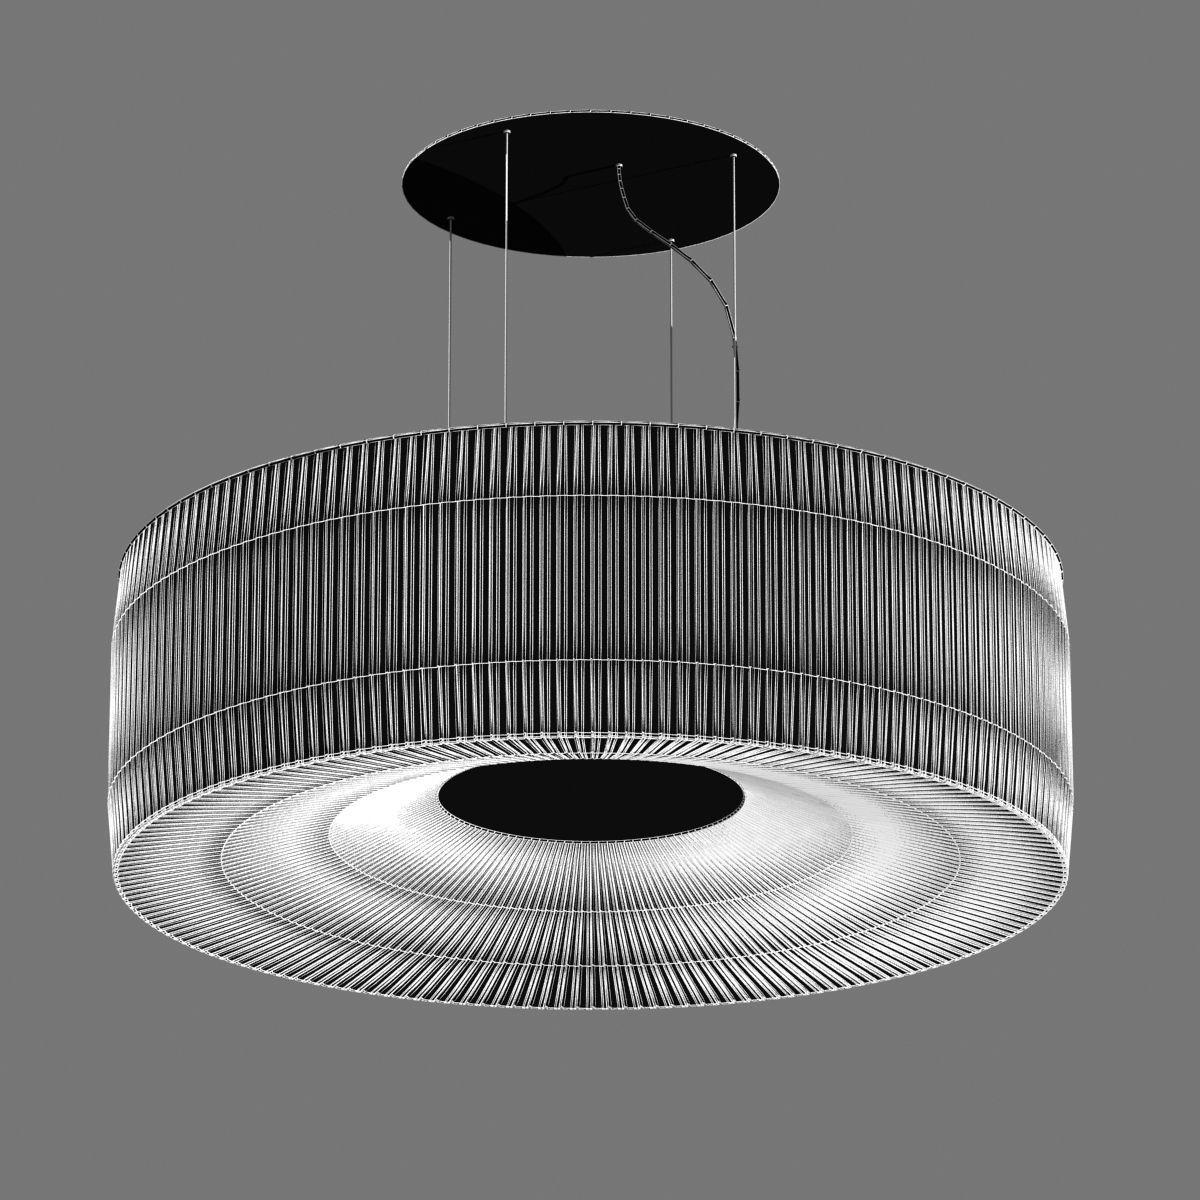 Tessuti round 4 light pendant light from masiero 3d model max obj tessuti round 4 light pendant light from masiero 3d model max obj 3ds fbx mtl unitypackage aloadofball Images